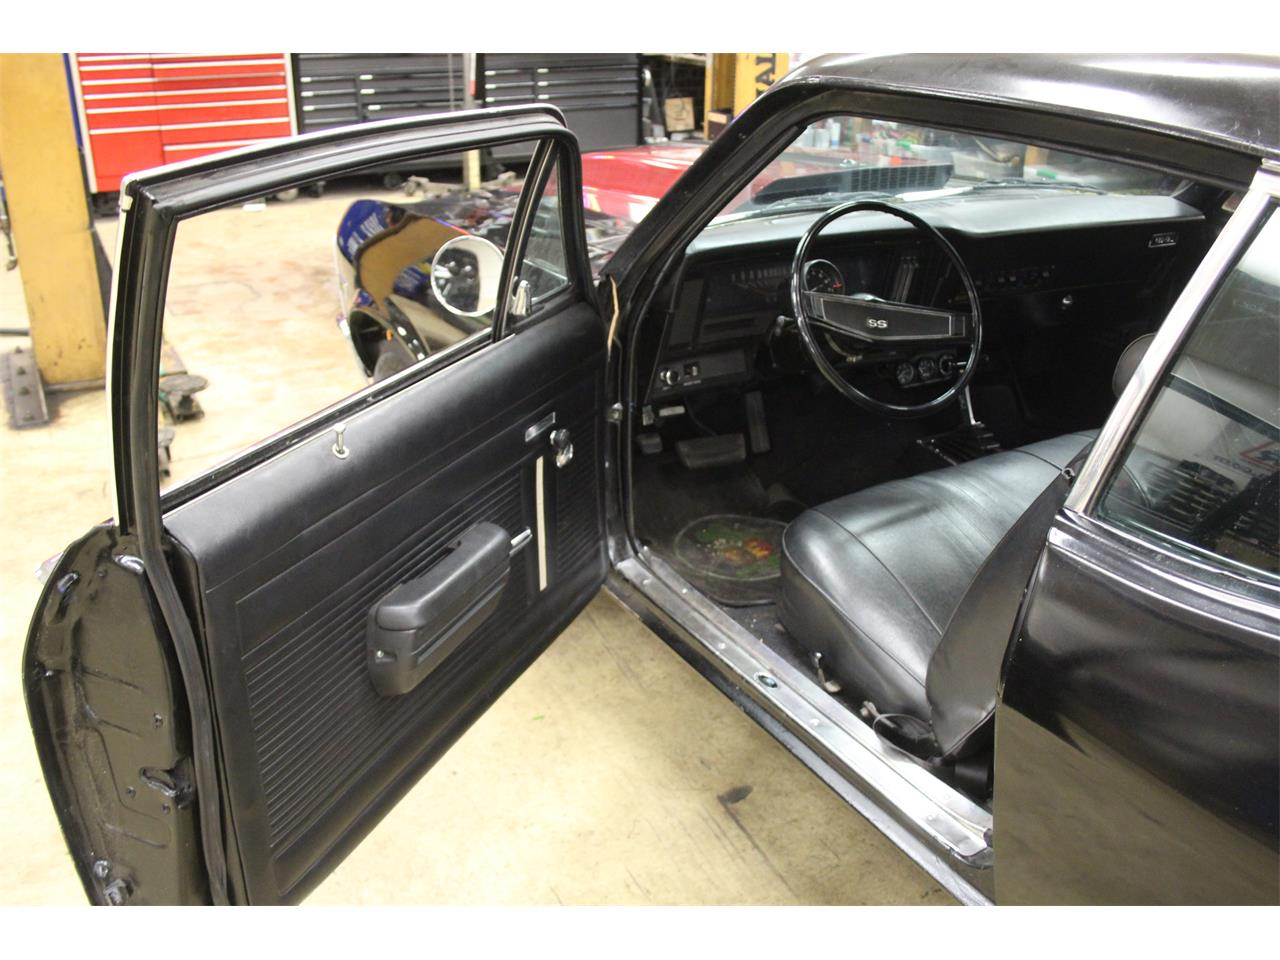 Large Picture of Classic 1972 Chevrolet Nova located in lake zurich Illinois - $17,900.00 - OT0W